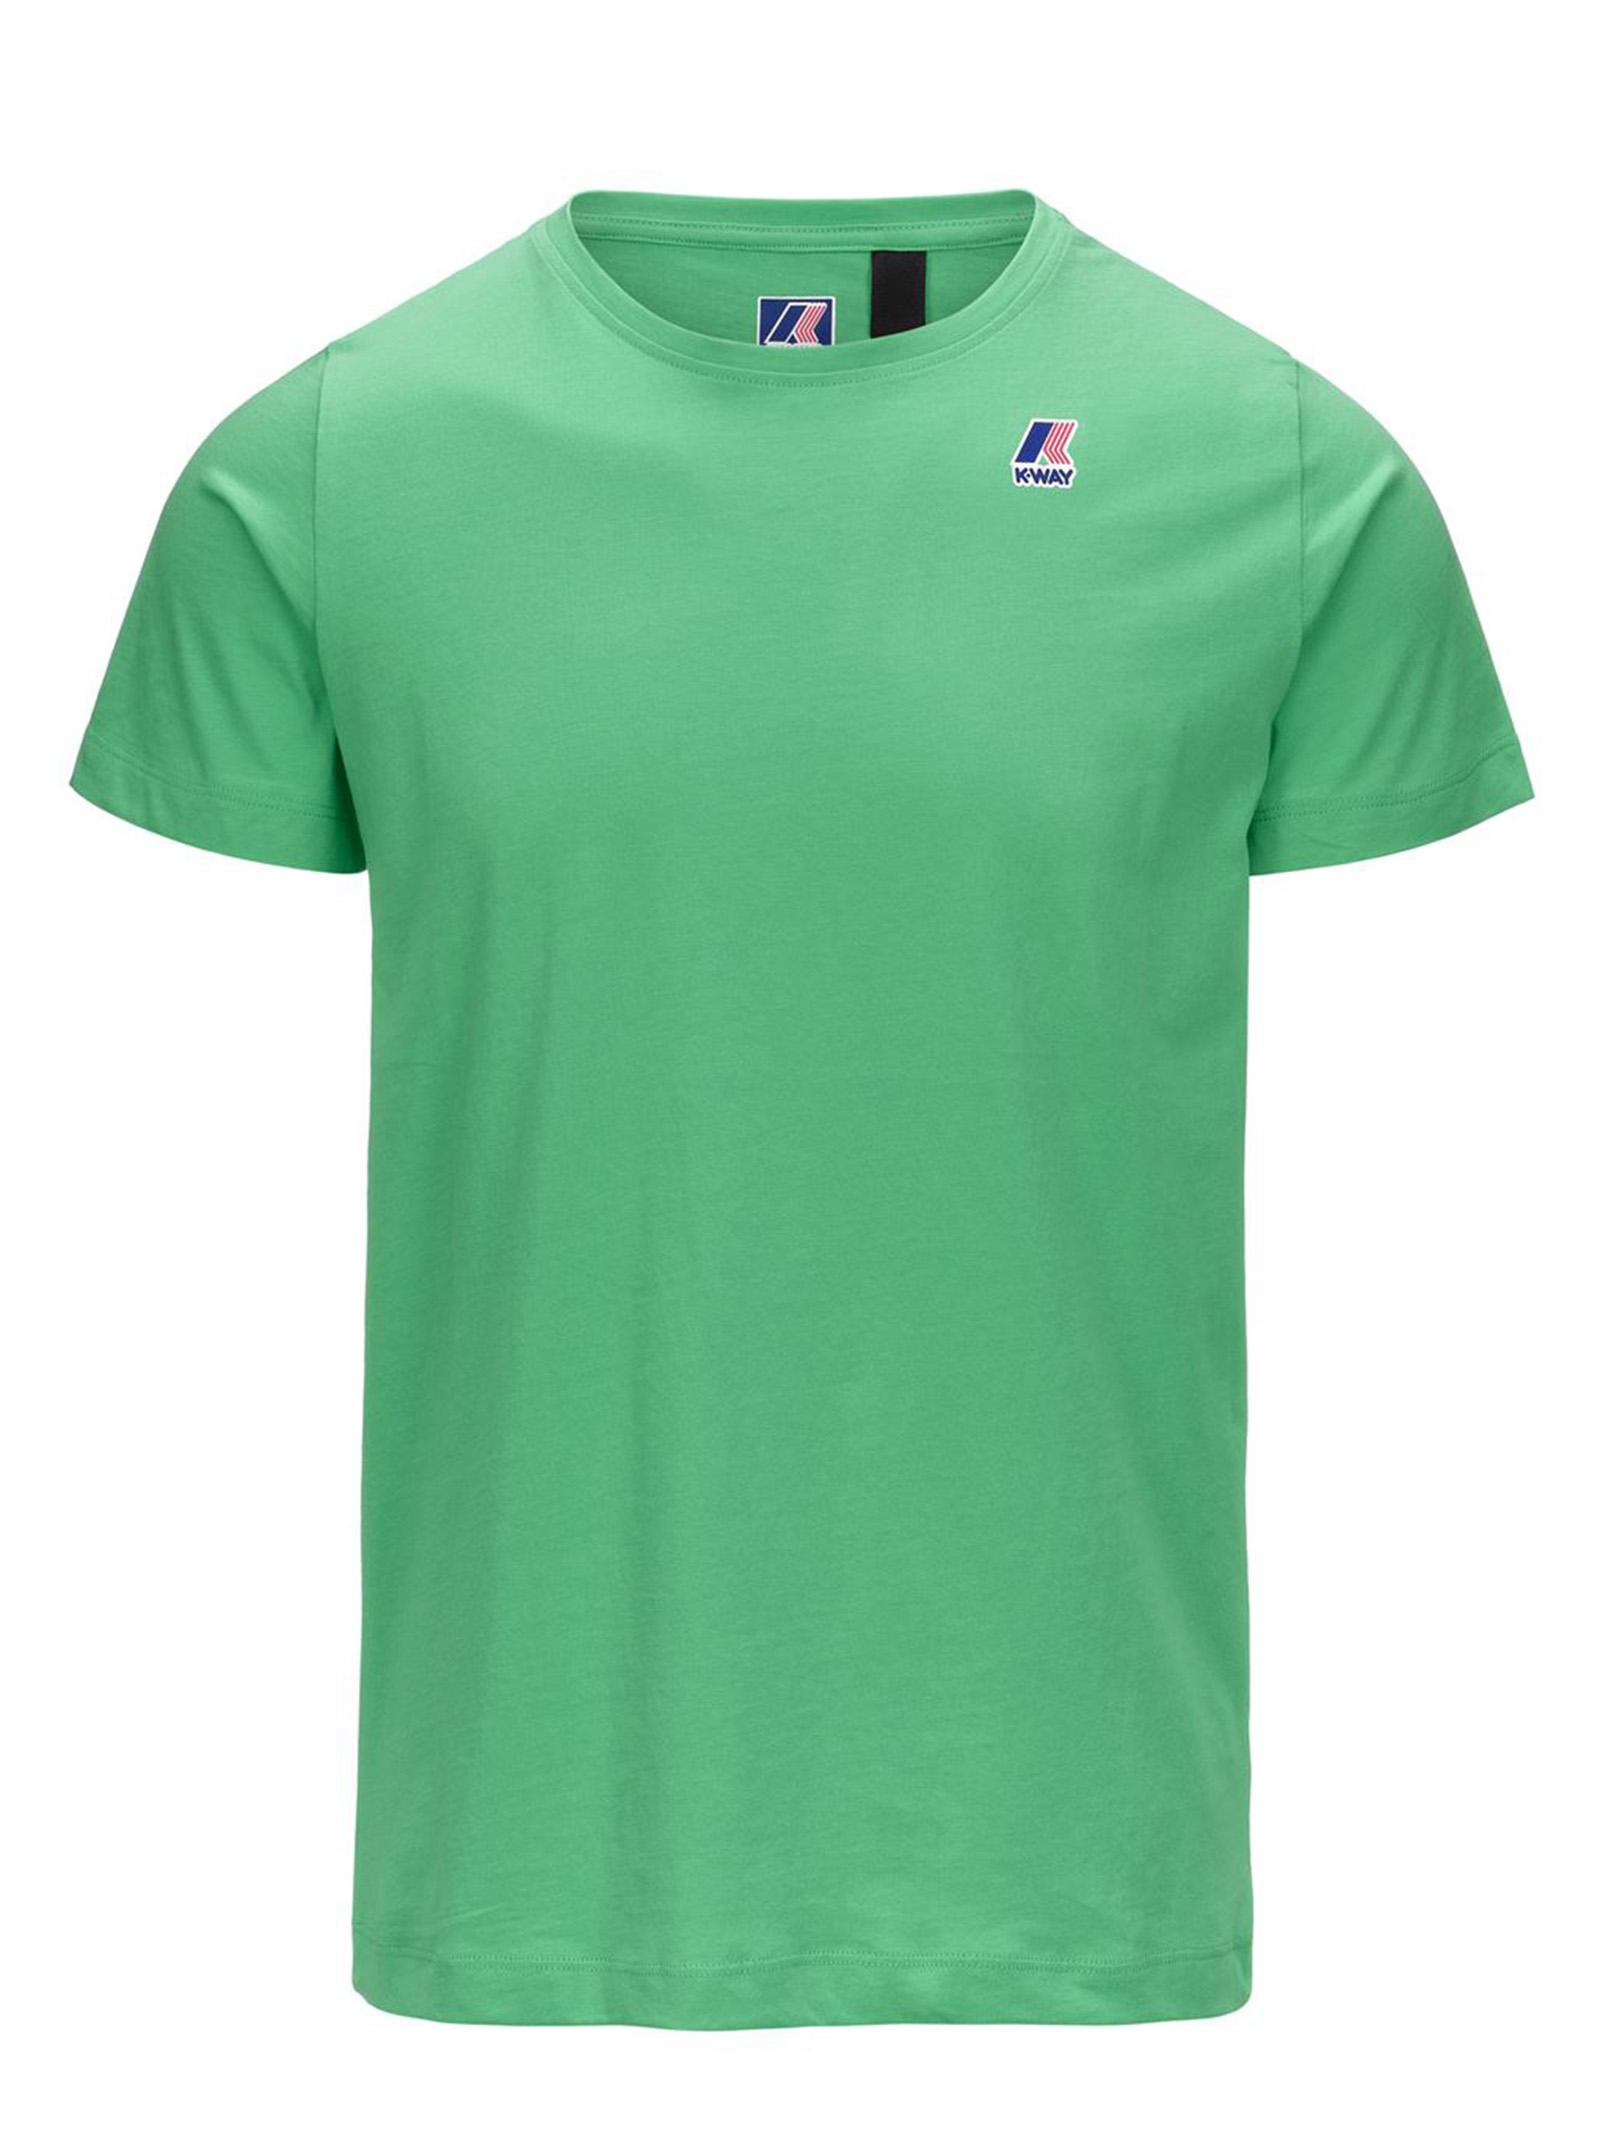 T-shirt EDOUARD K-WAY | T-shirt | K007JE0W8B